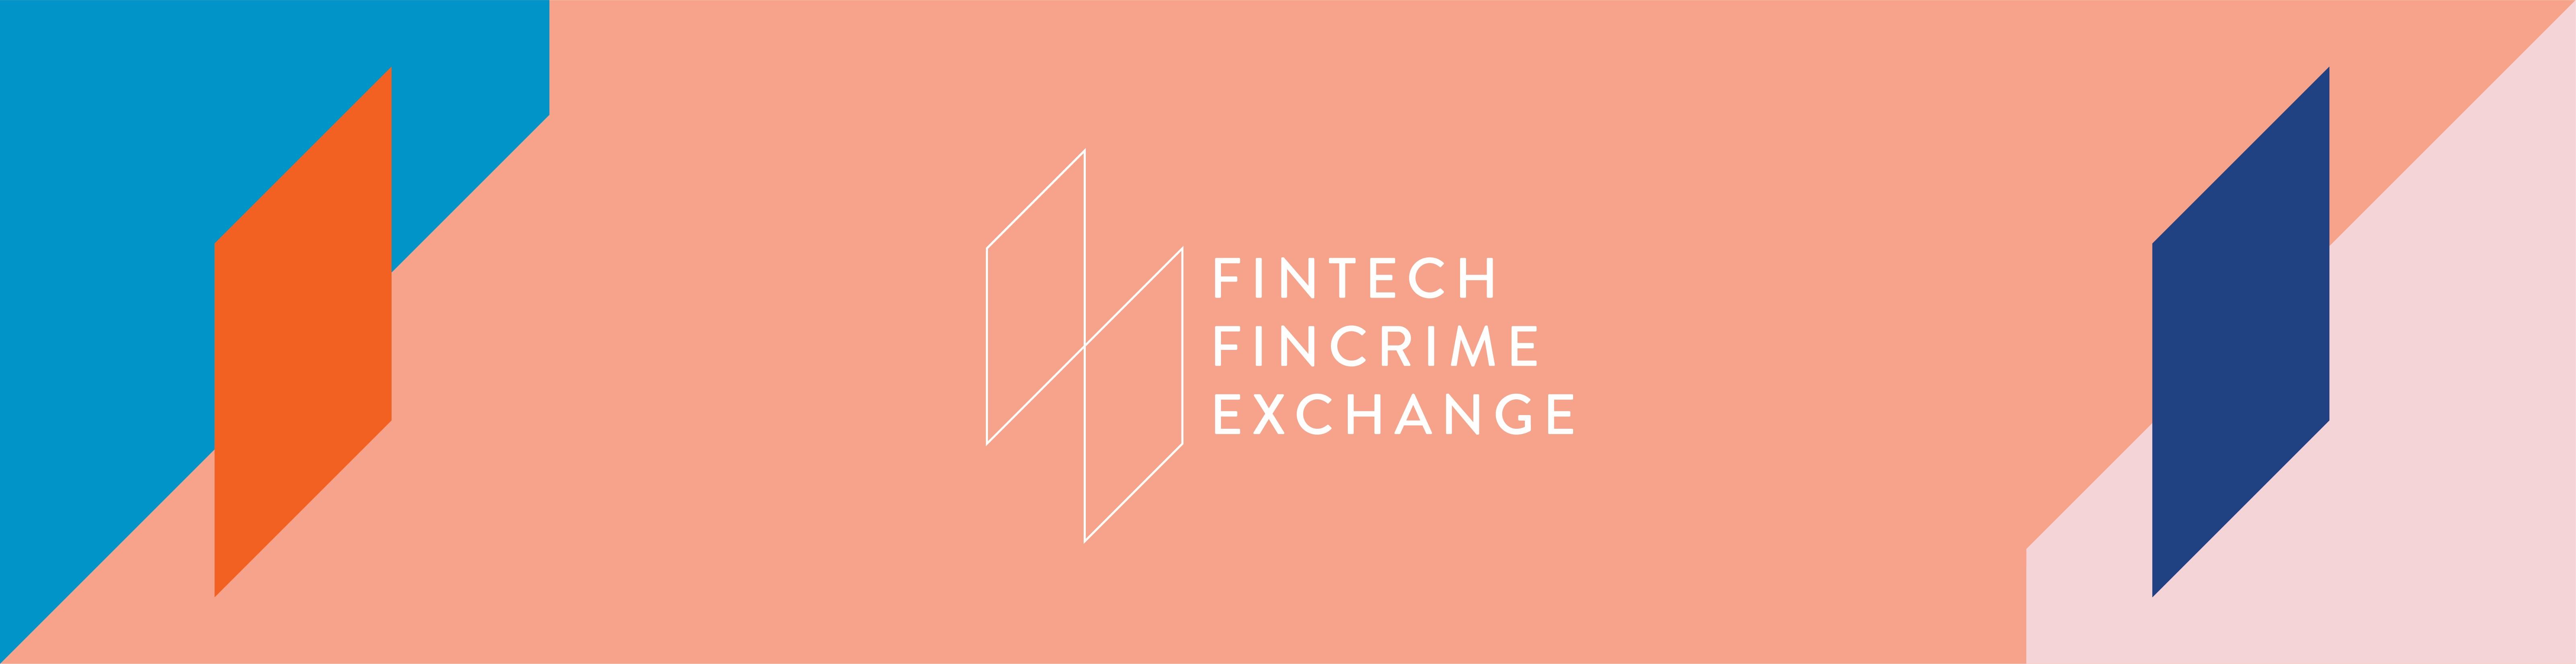 FinTech FinCrime Exchange | LinkedIn